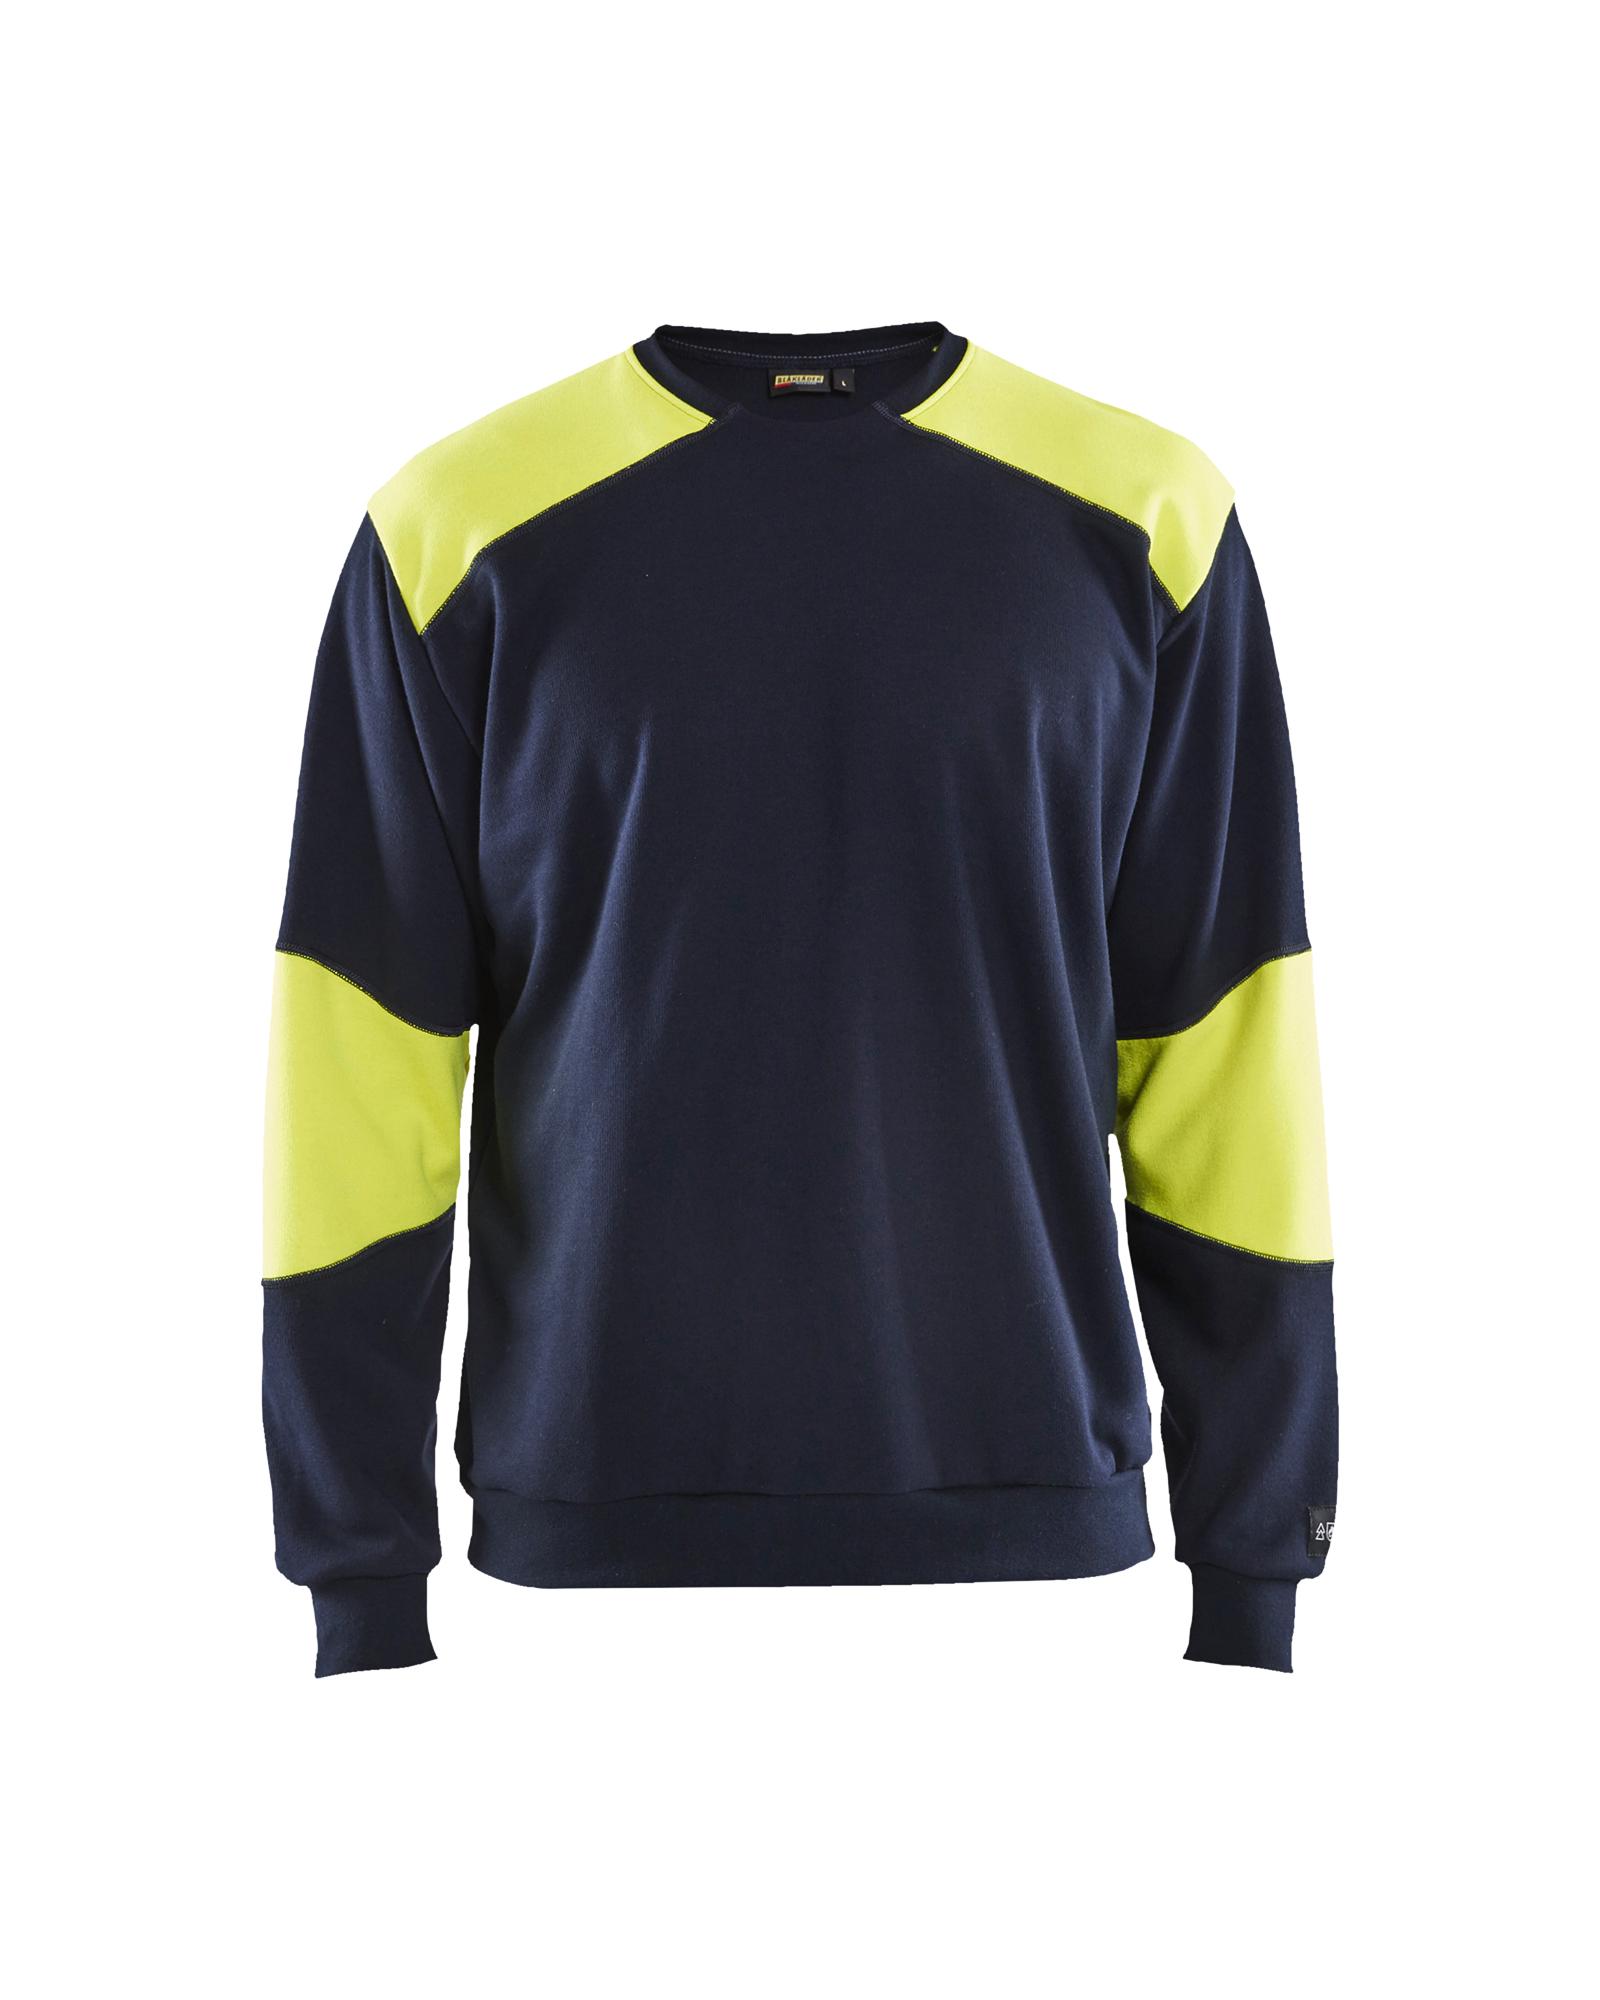 Vlamvertragend sweatshirt